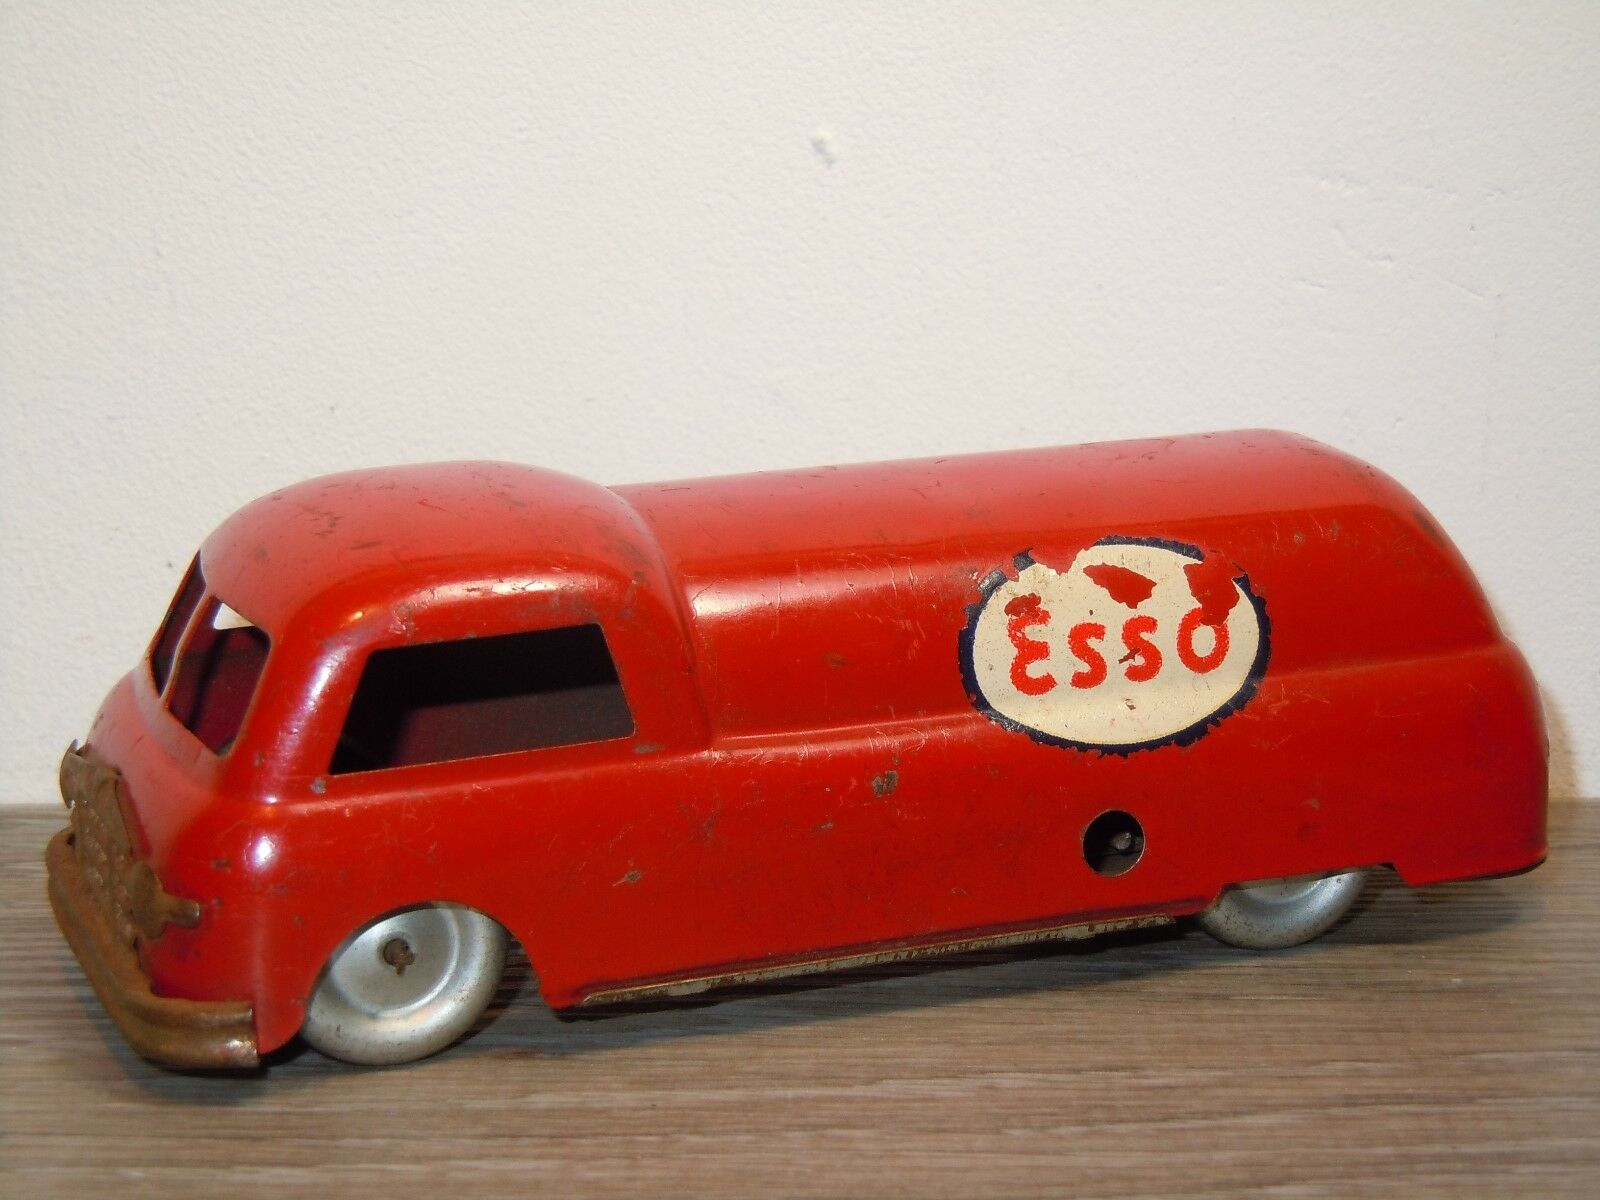 Old Petrol Tanker Esso - Ingap Padova  500 - Tinplate Toy 35339